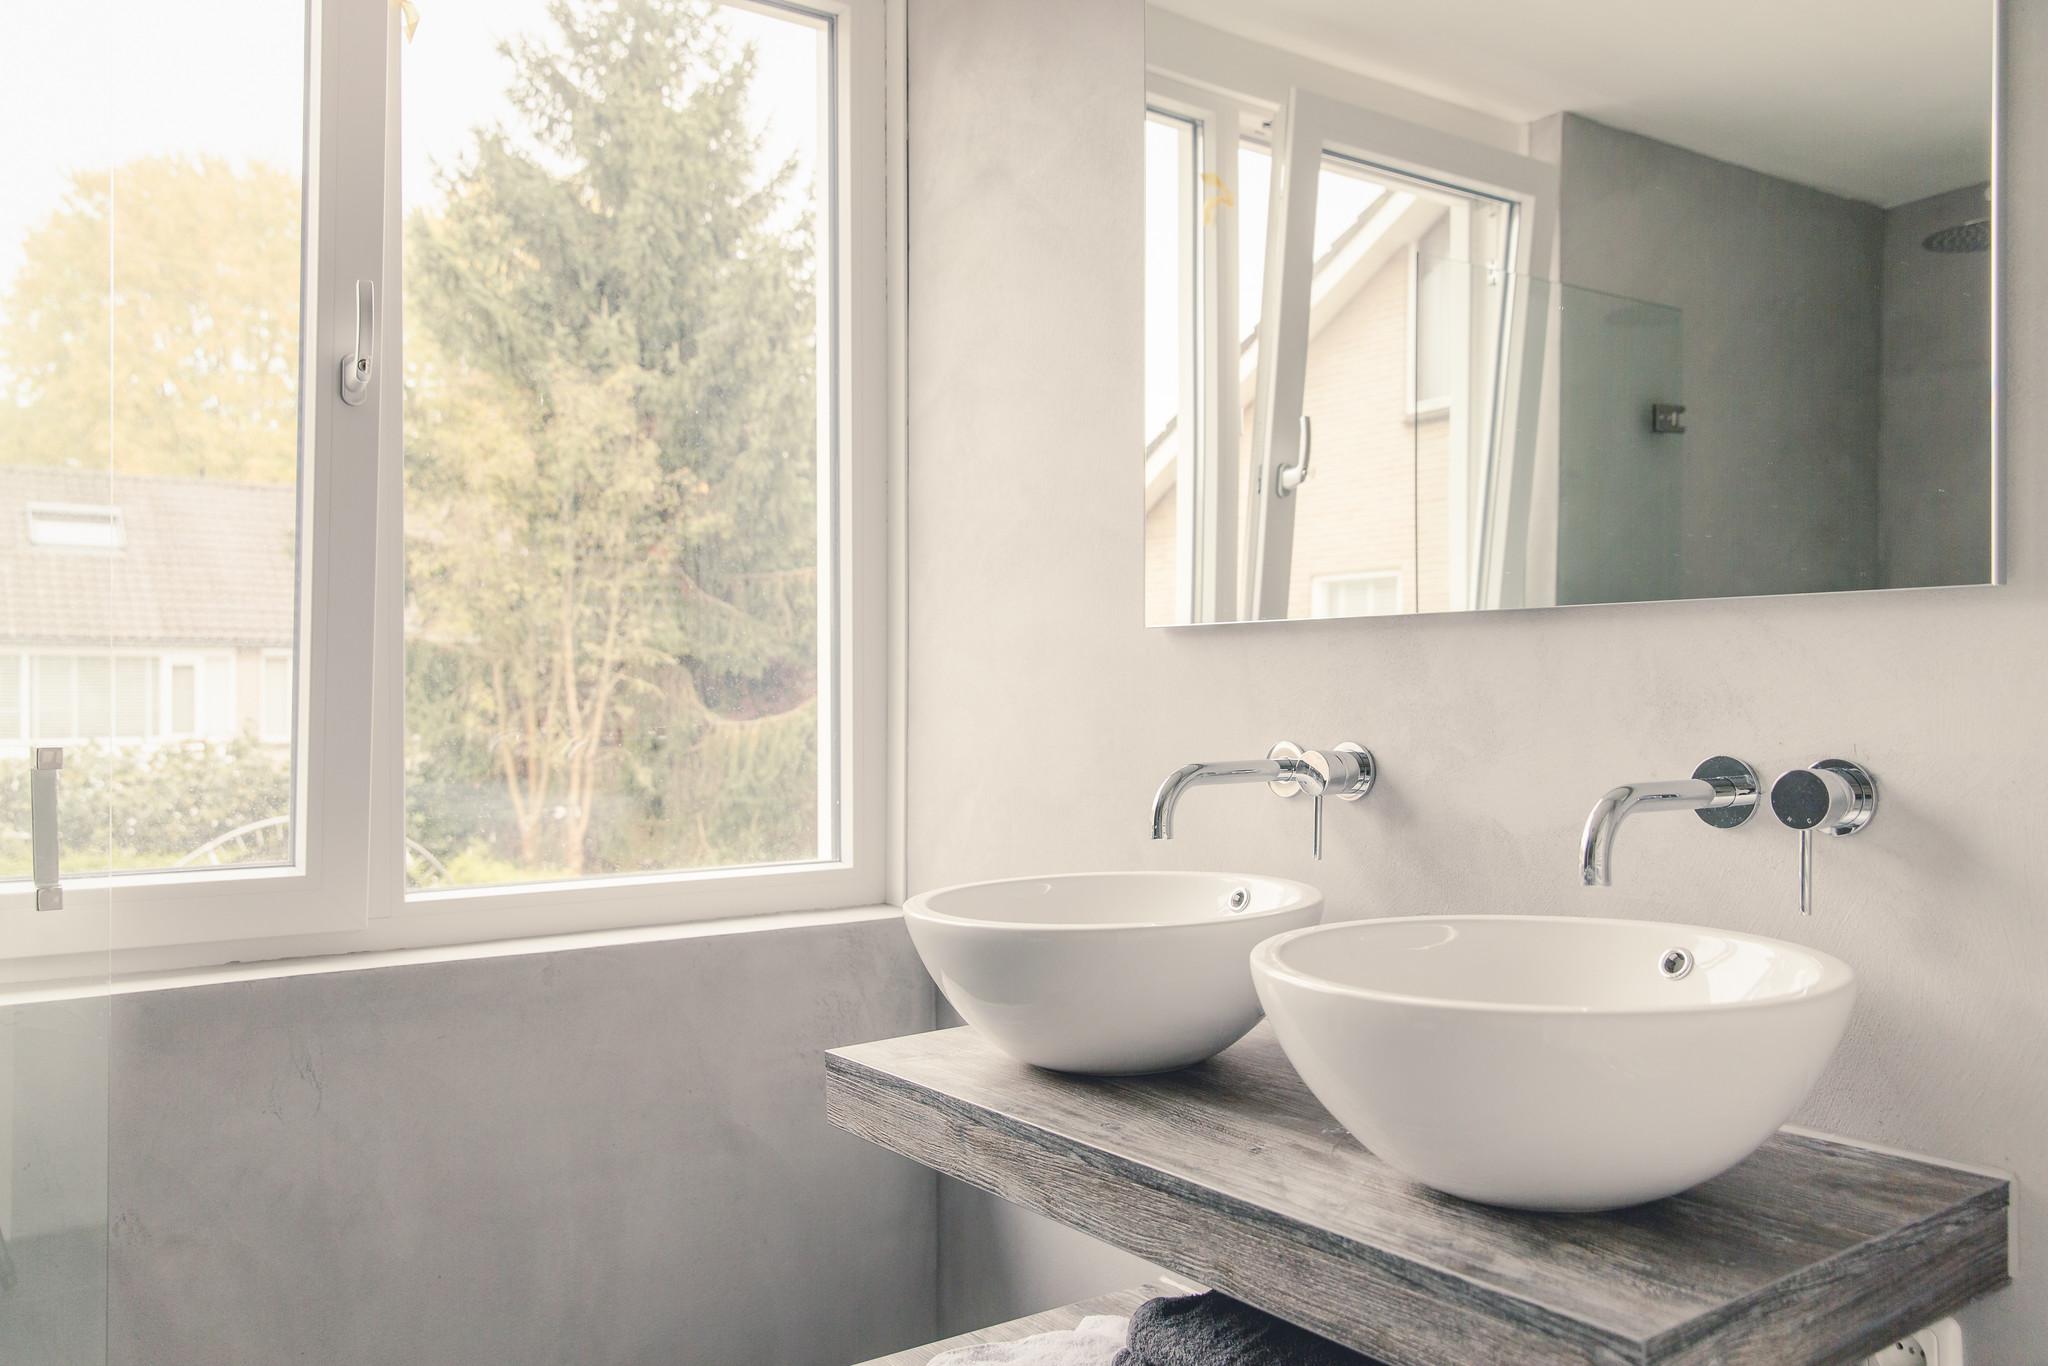 Betonoptik Badezimmer - Home of Concrete